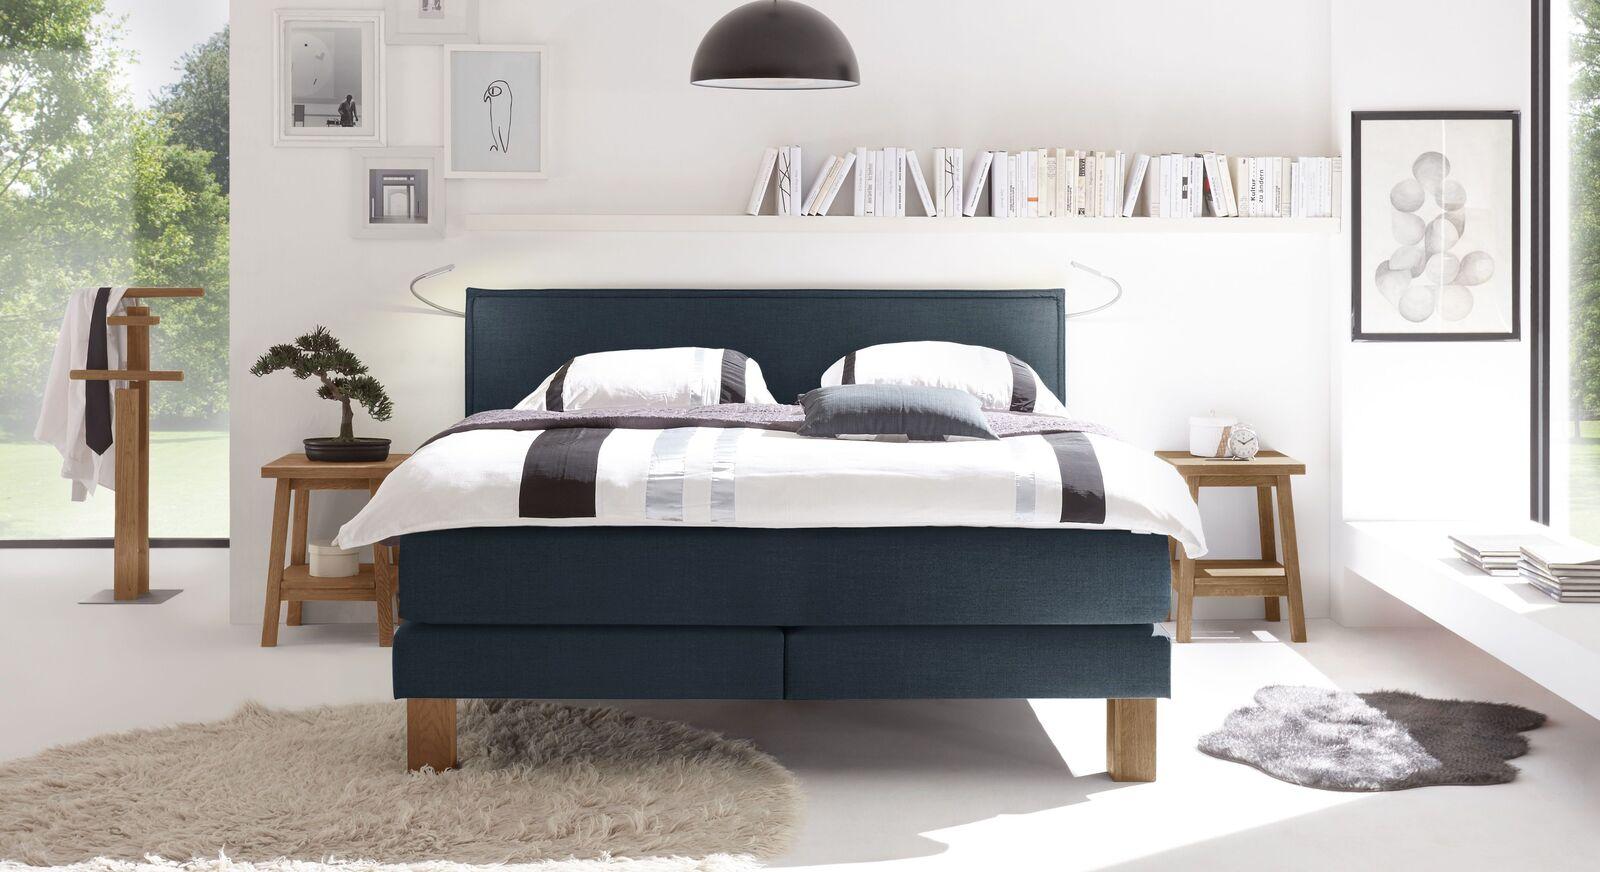 Boxspringbett Oss mit passenden Schlafzimmer-Möbeln